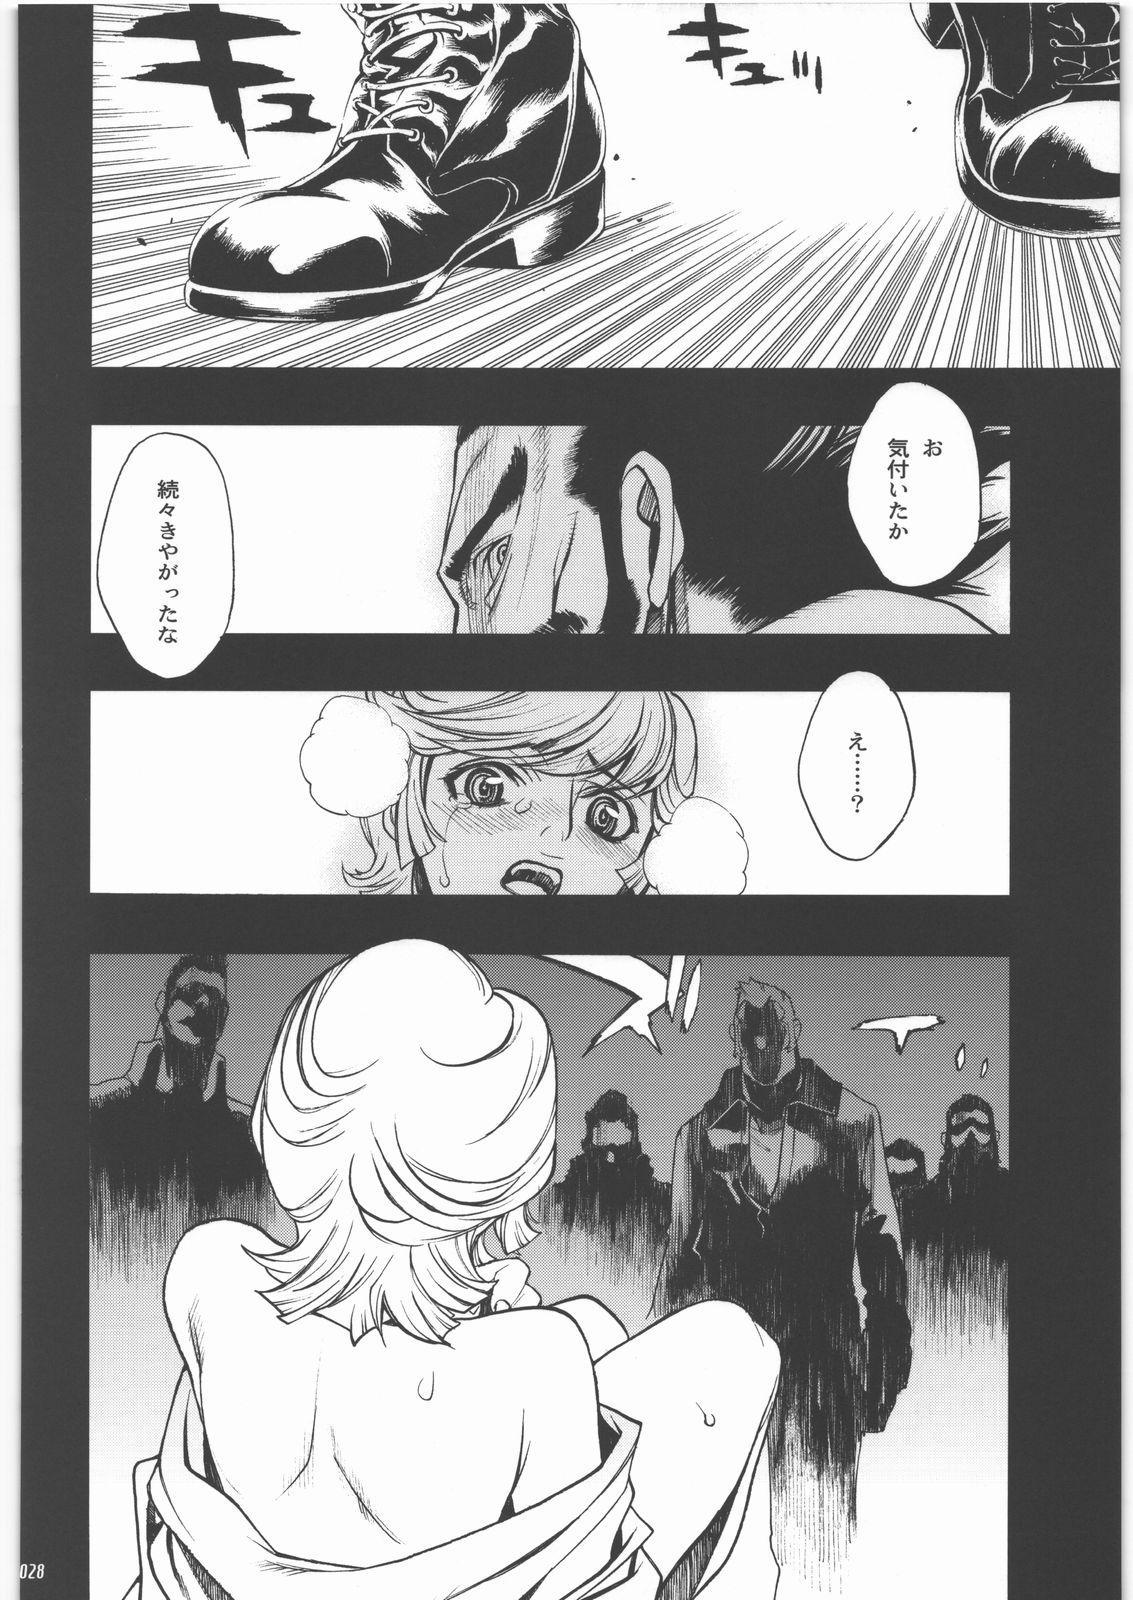 Audrey - Shoujo Set 24